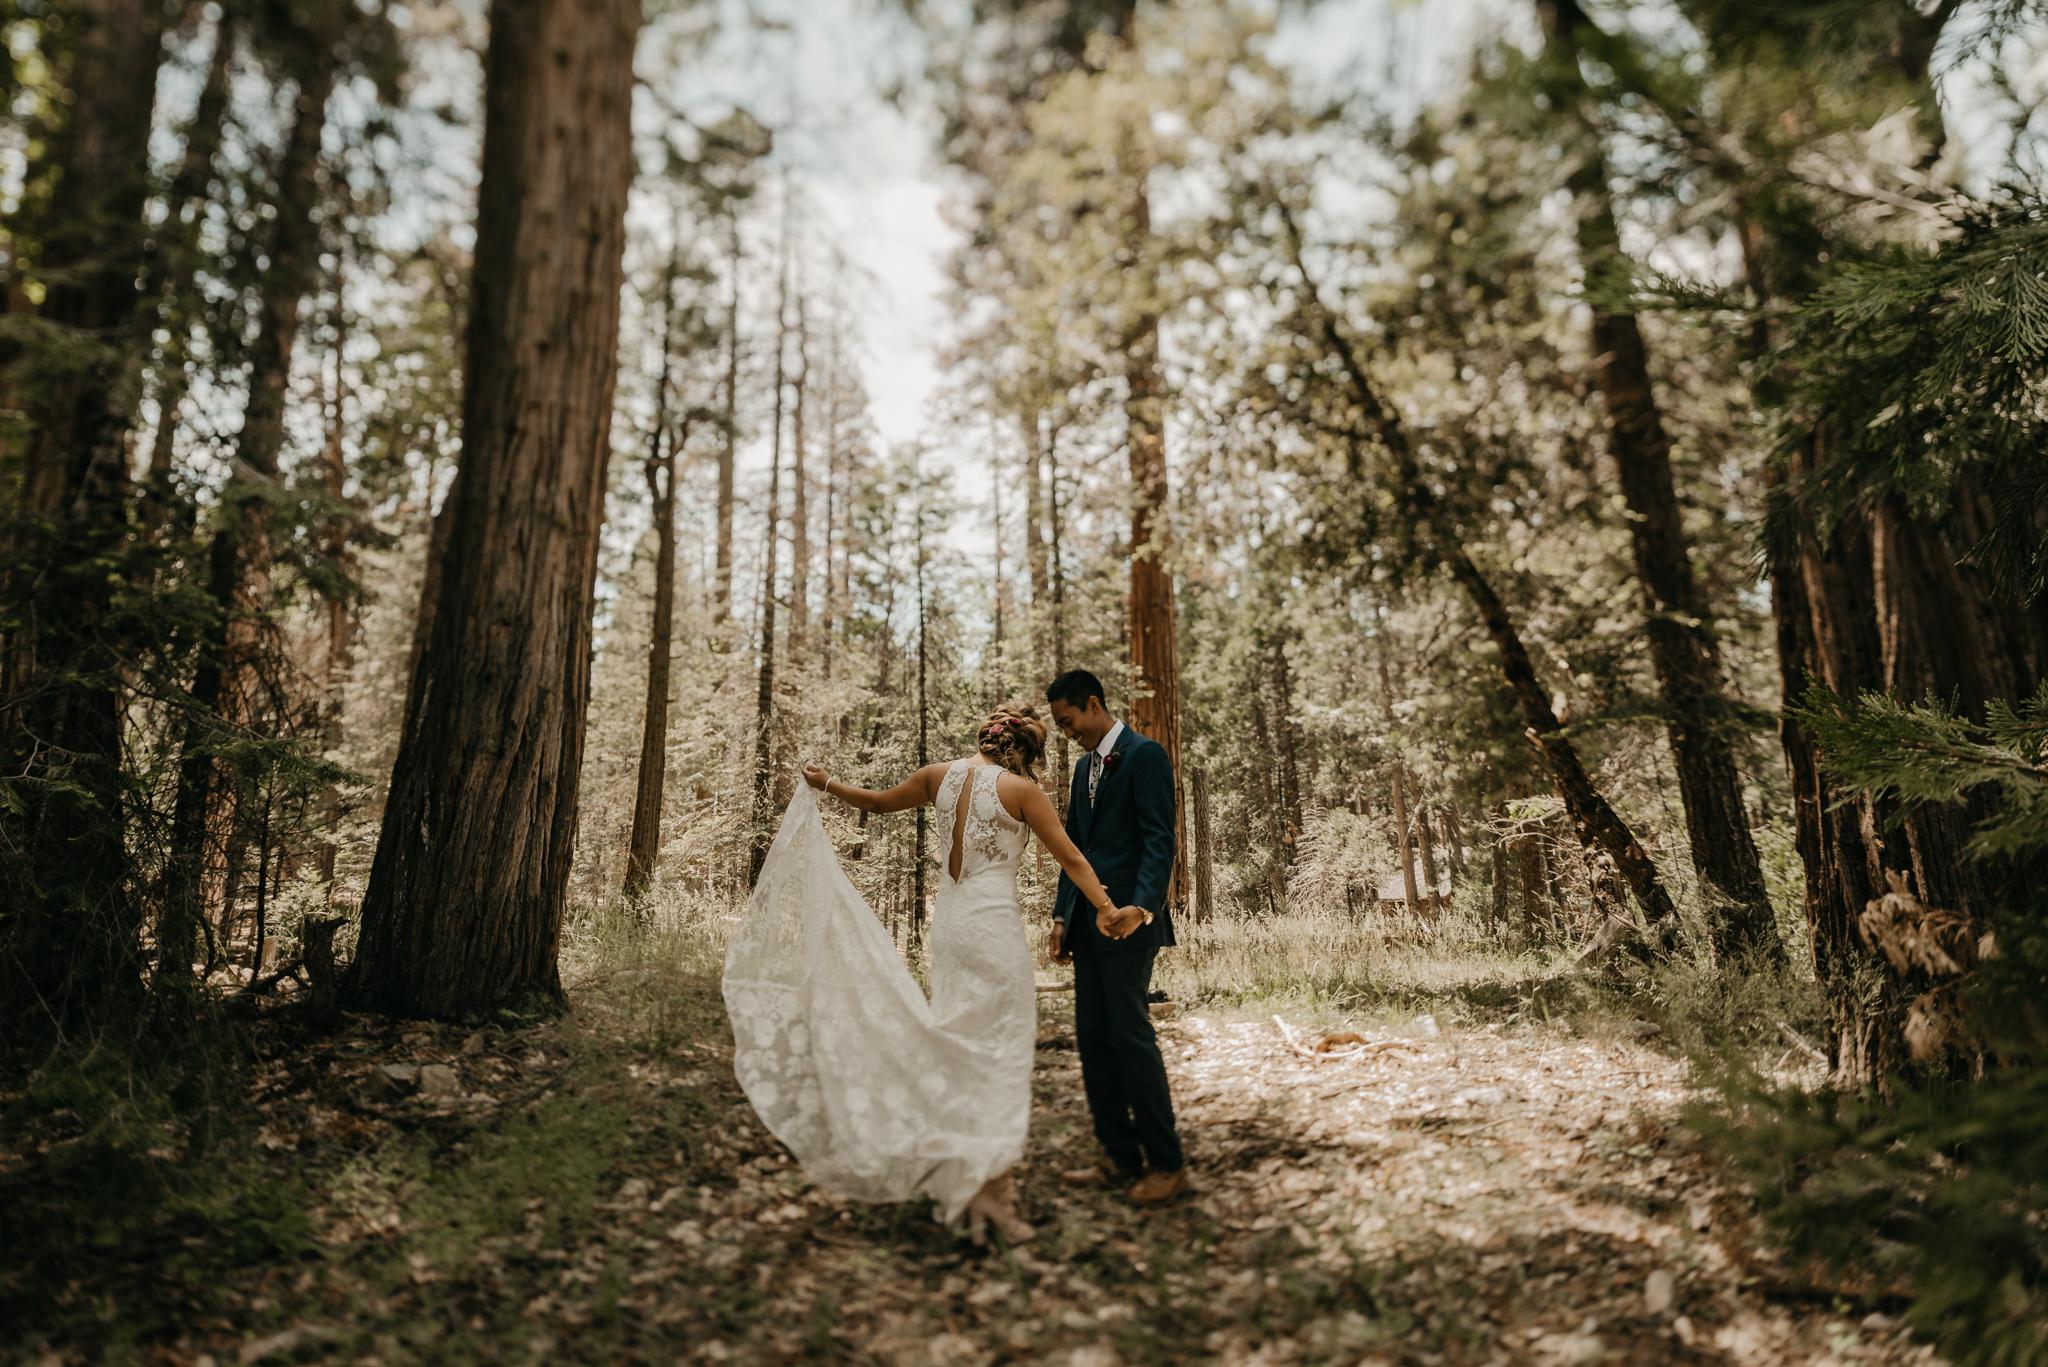 © Isaiah + Taylor Photography - Evergreen Lodge Destination Yoesmite Wedding - Los Angeles Wedding Photographer-074.jpg